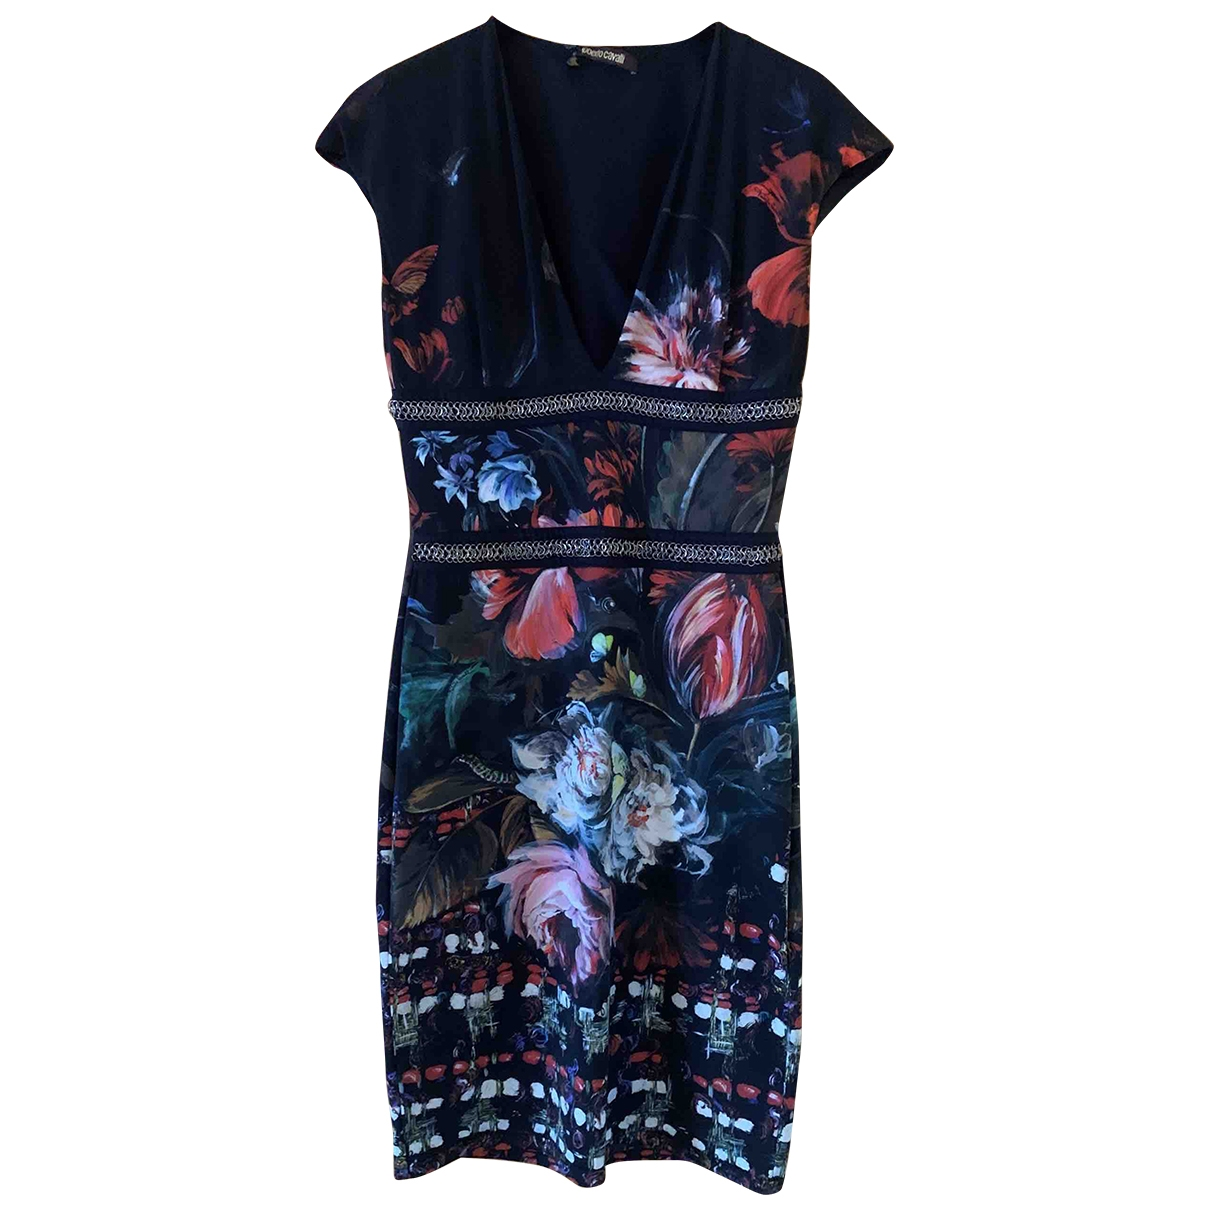 Roberto Cavalli \N Multicolour dress for Women 42 IT